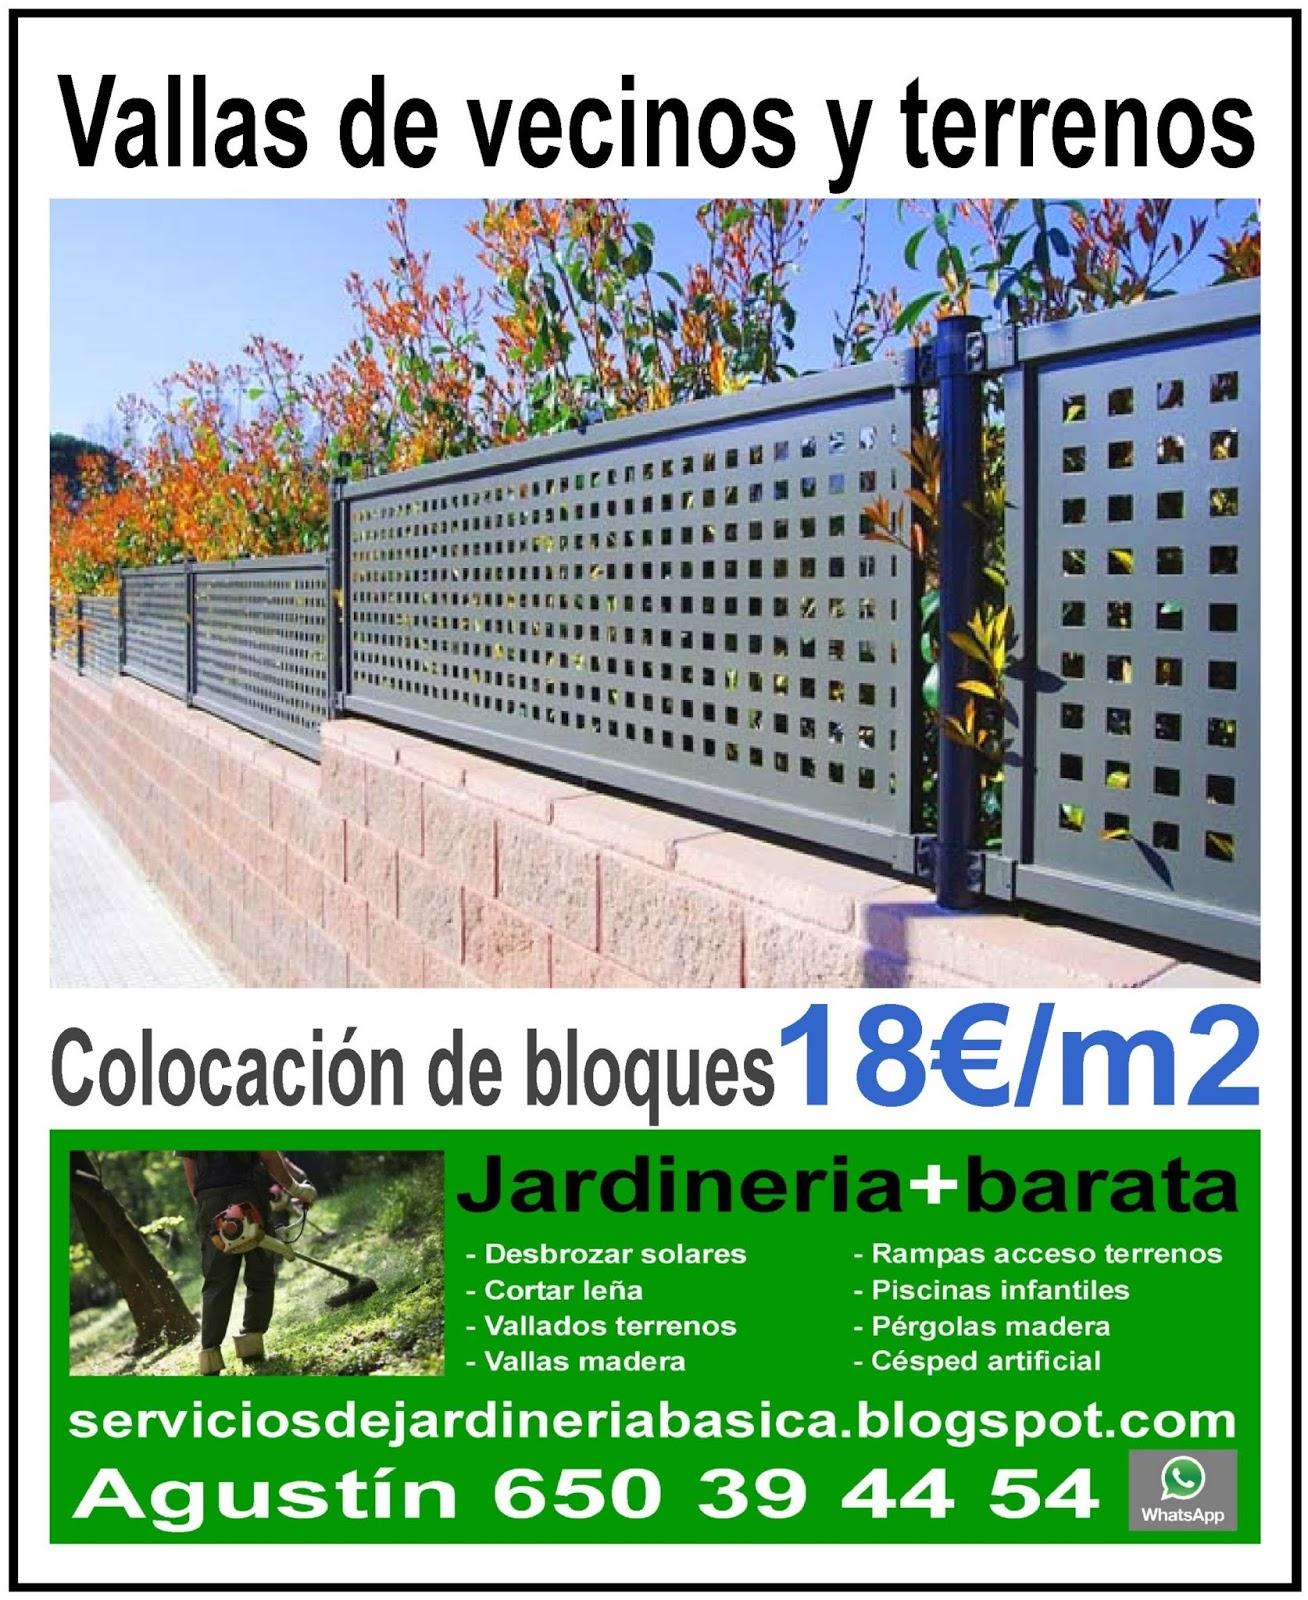 Serviciosdejardineriabasica mayo 2017 for Jardineria barata barcelona